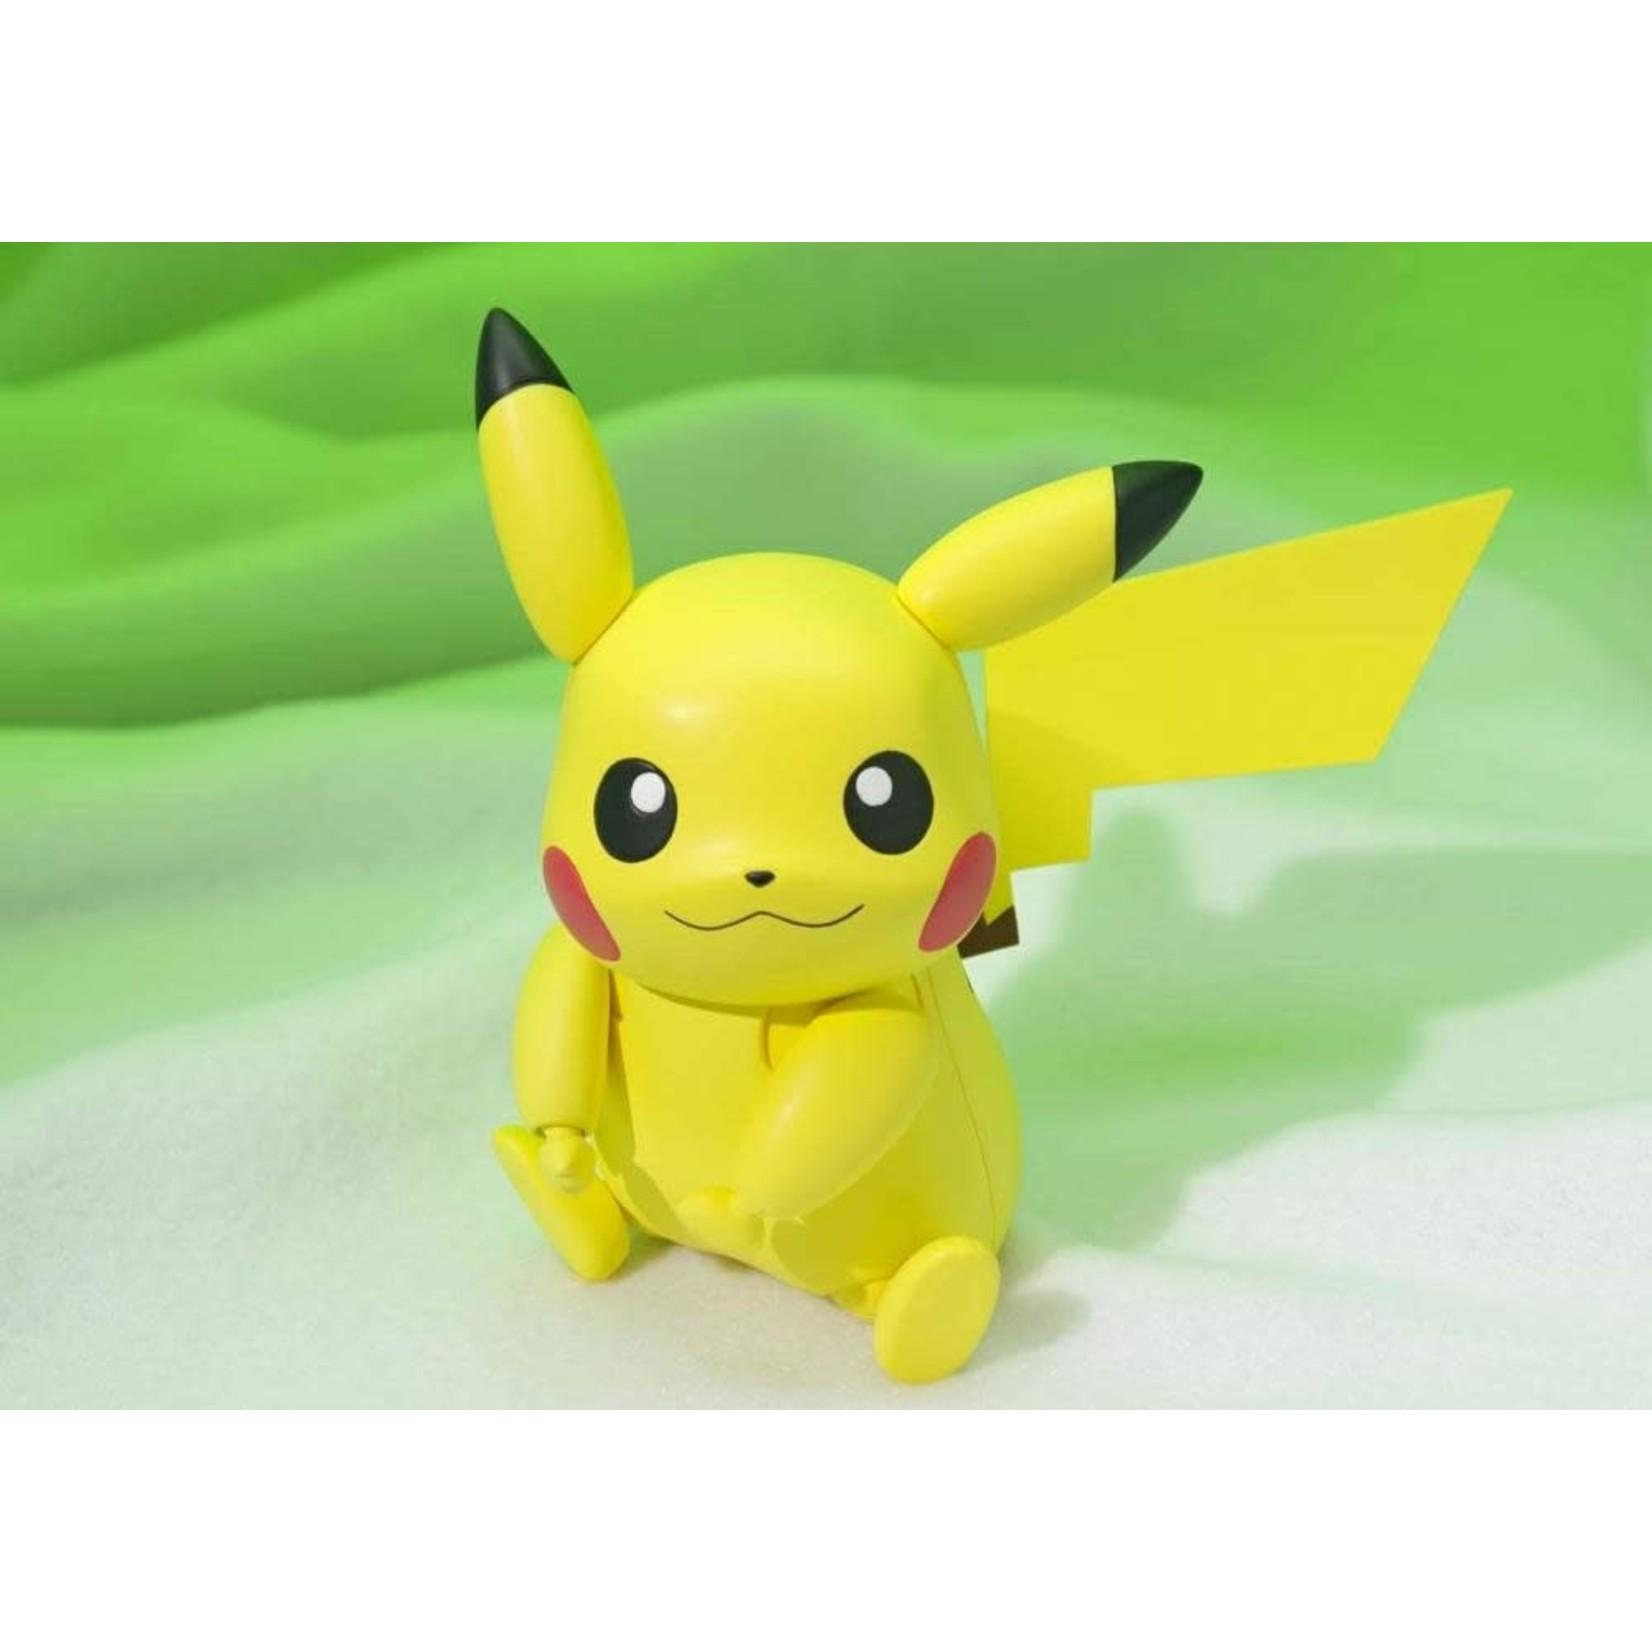 Bandai S.H.Figuarts Pikachu